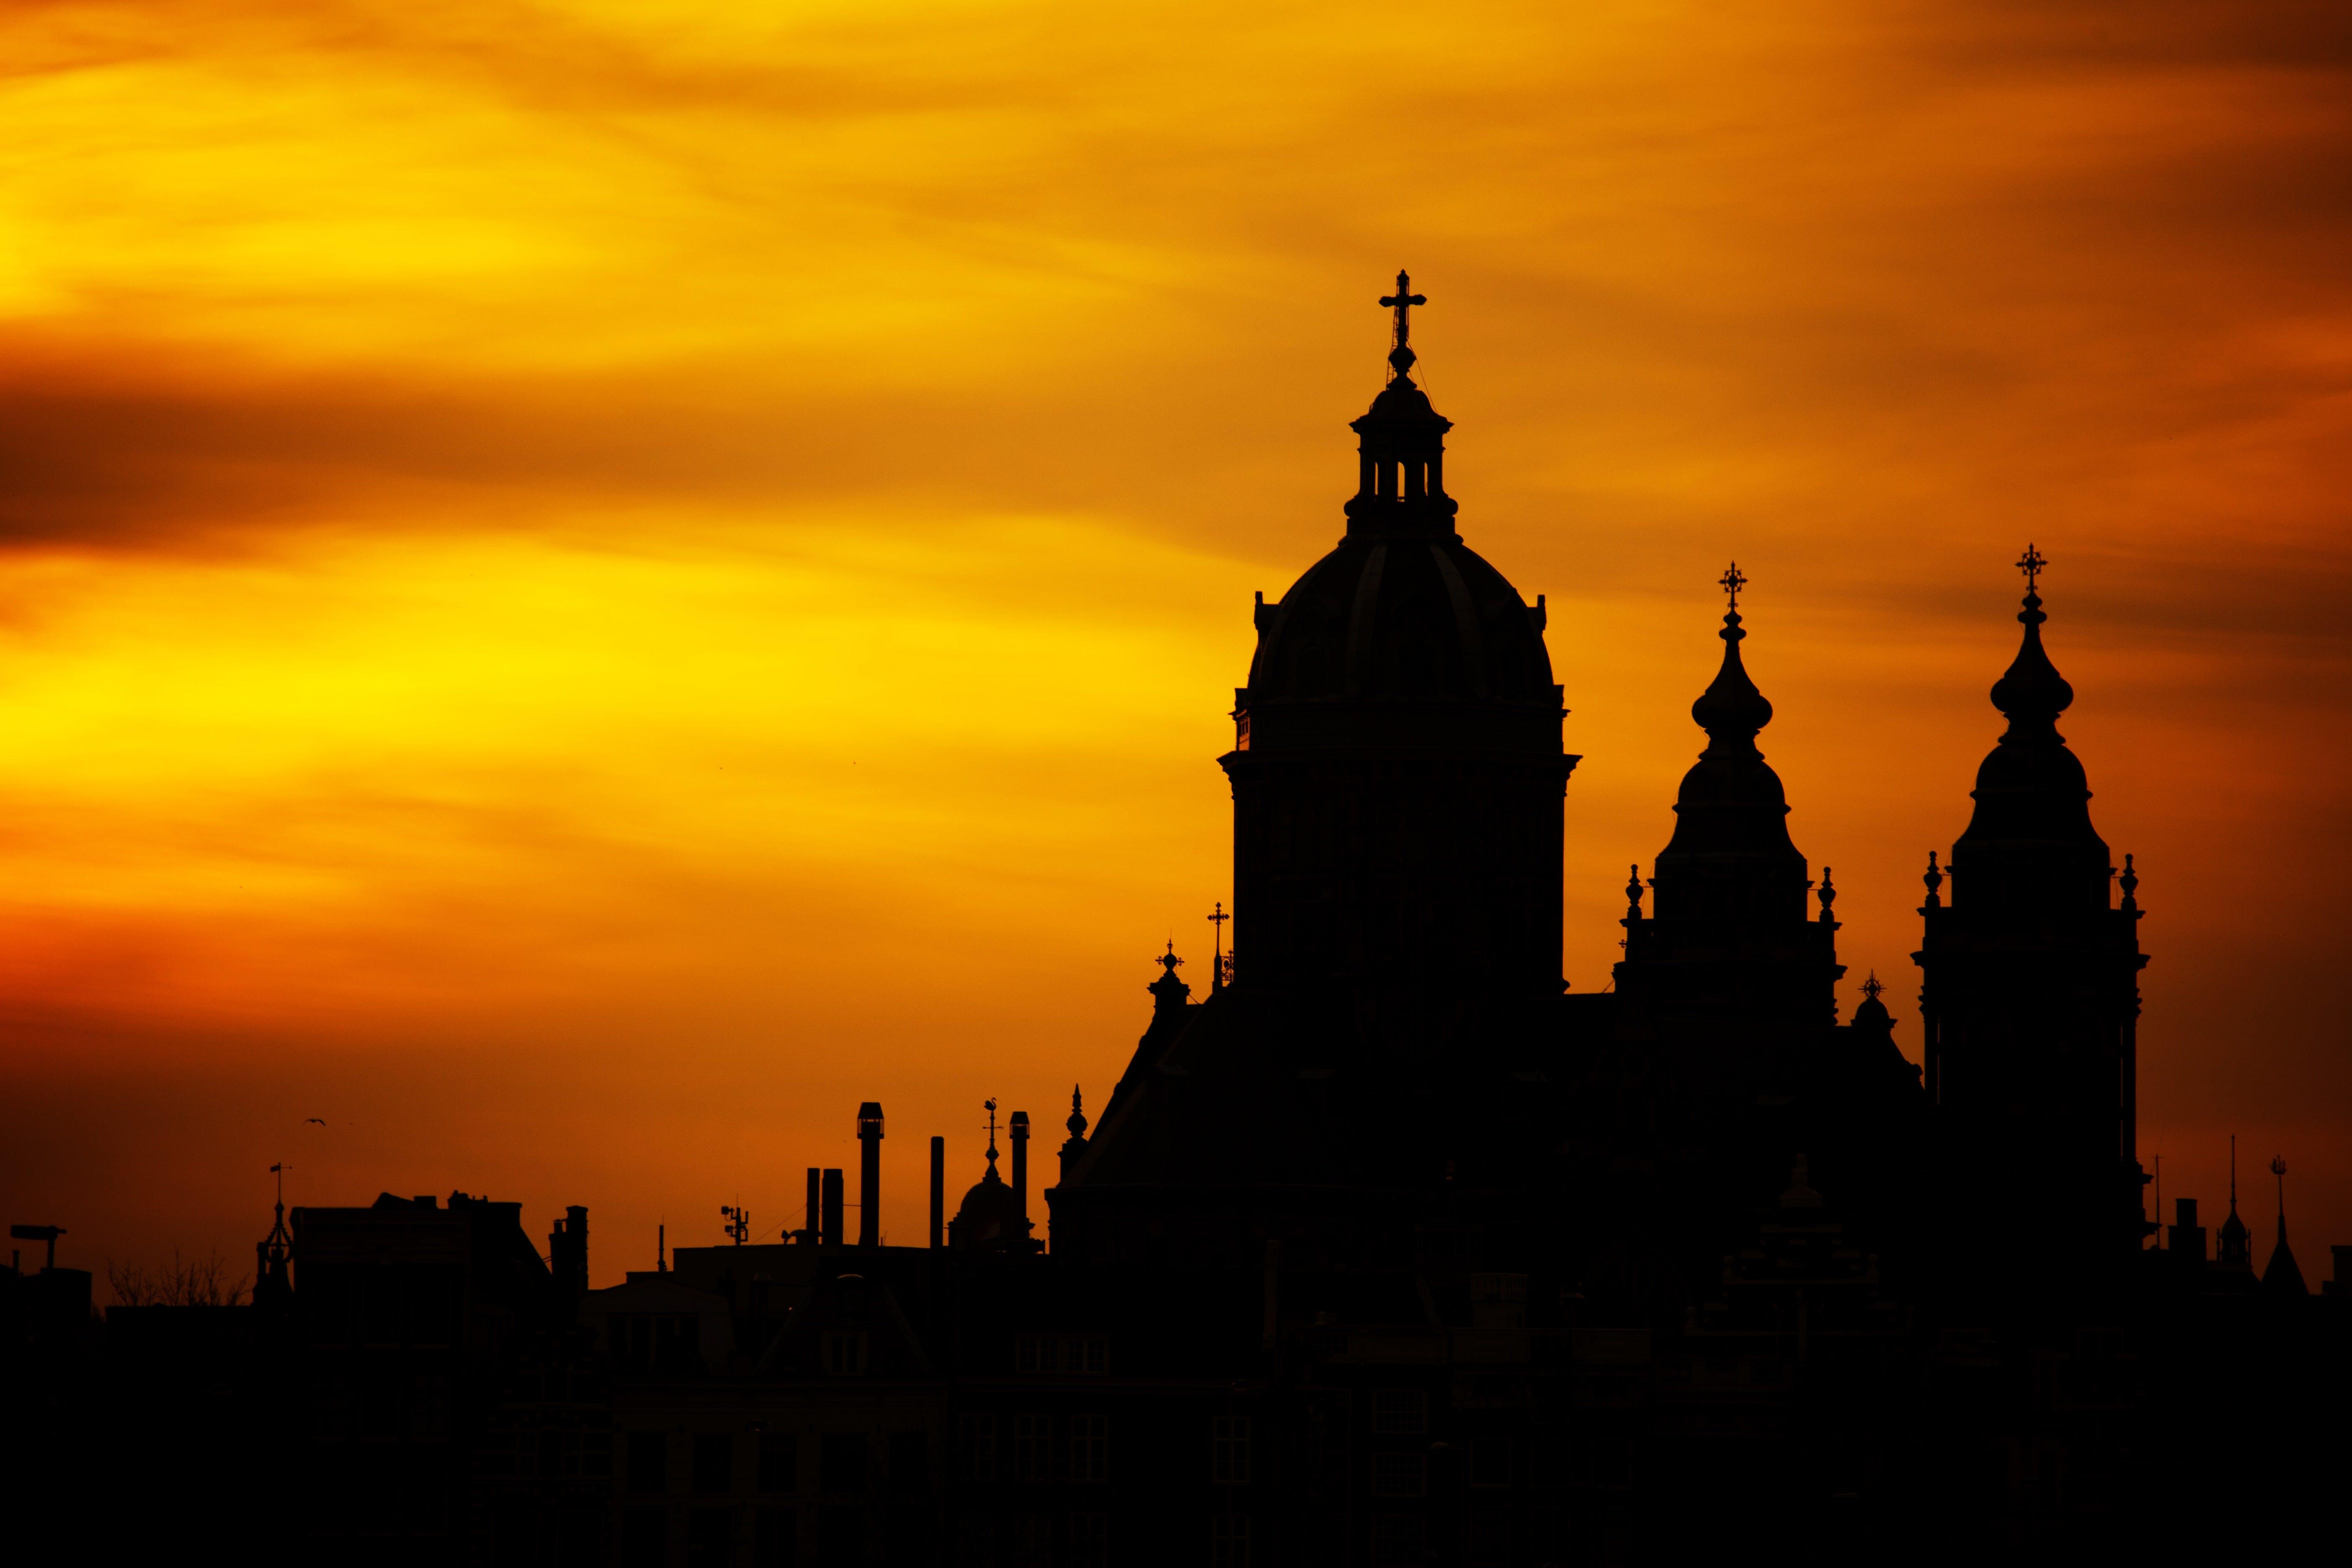 Silhouette Photo of Church